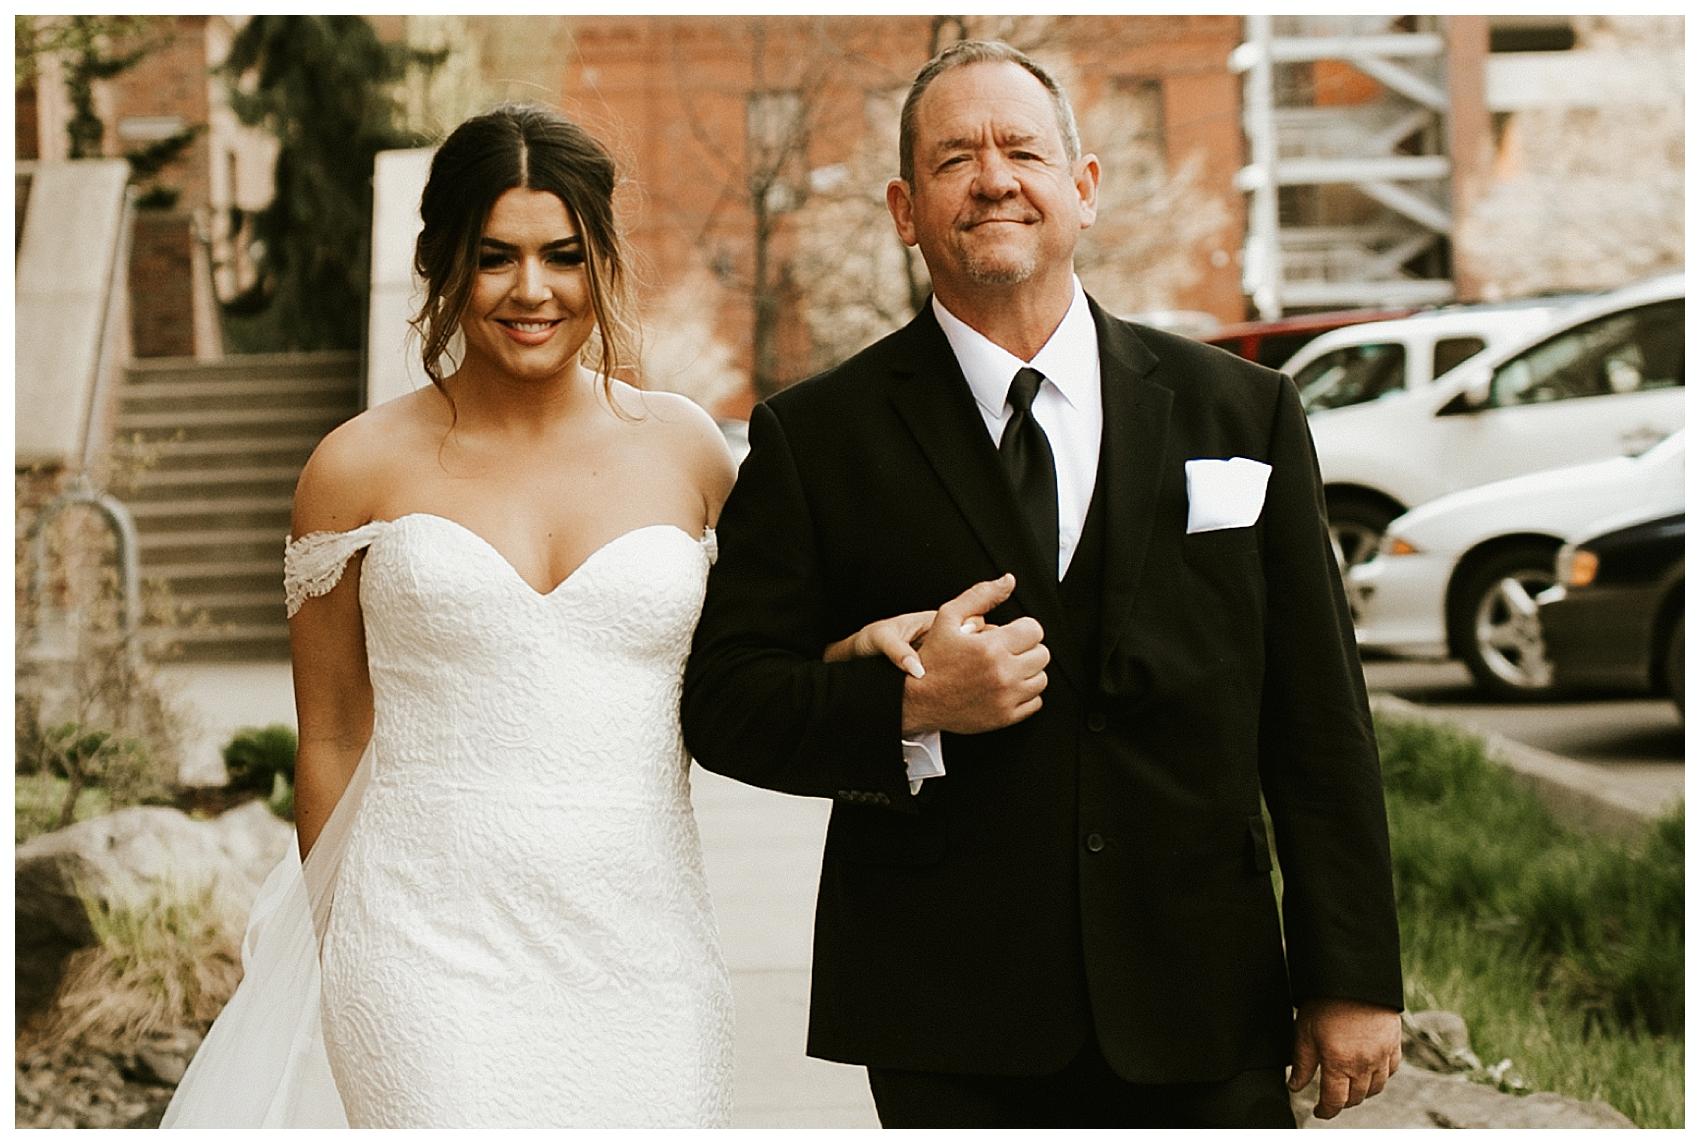 Chateau Rive Spokane Wedding Cassie Trottier Photography01046.jpg